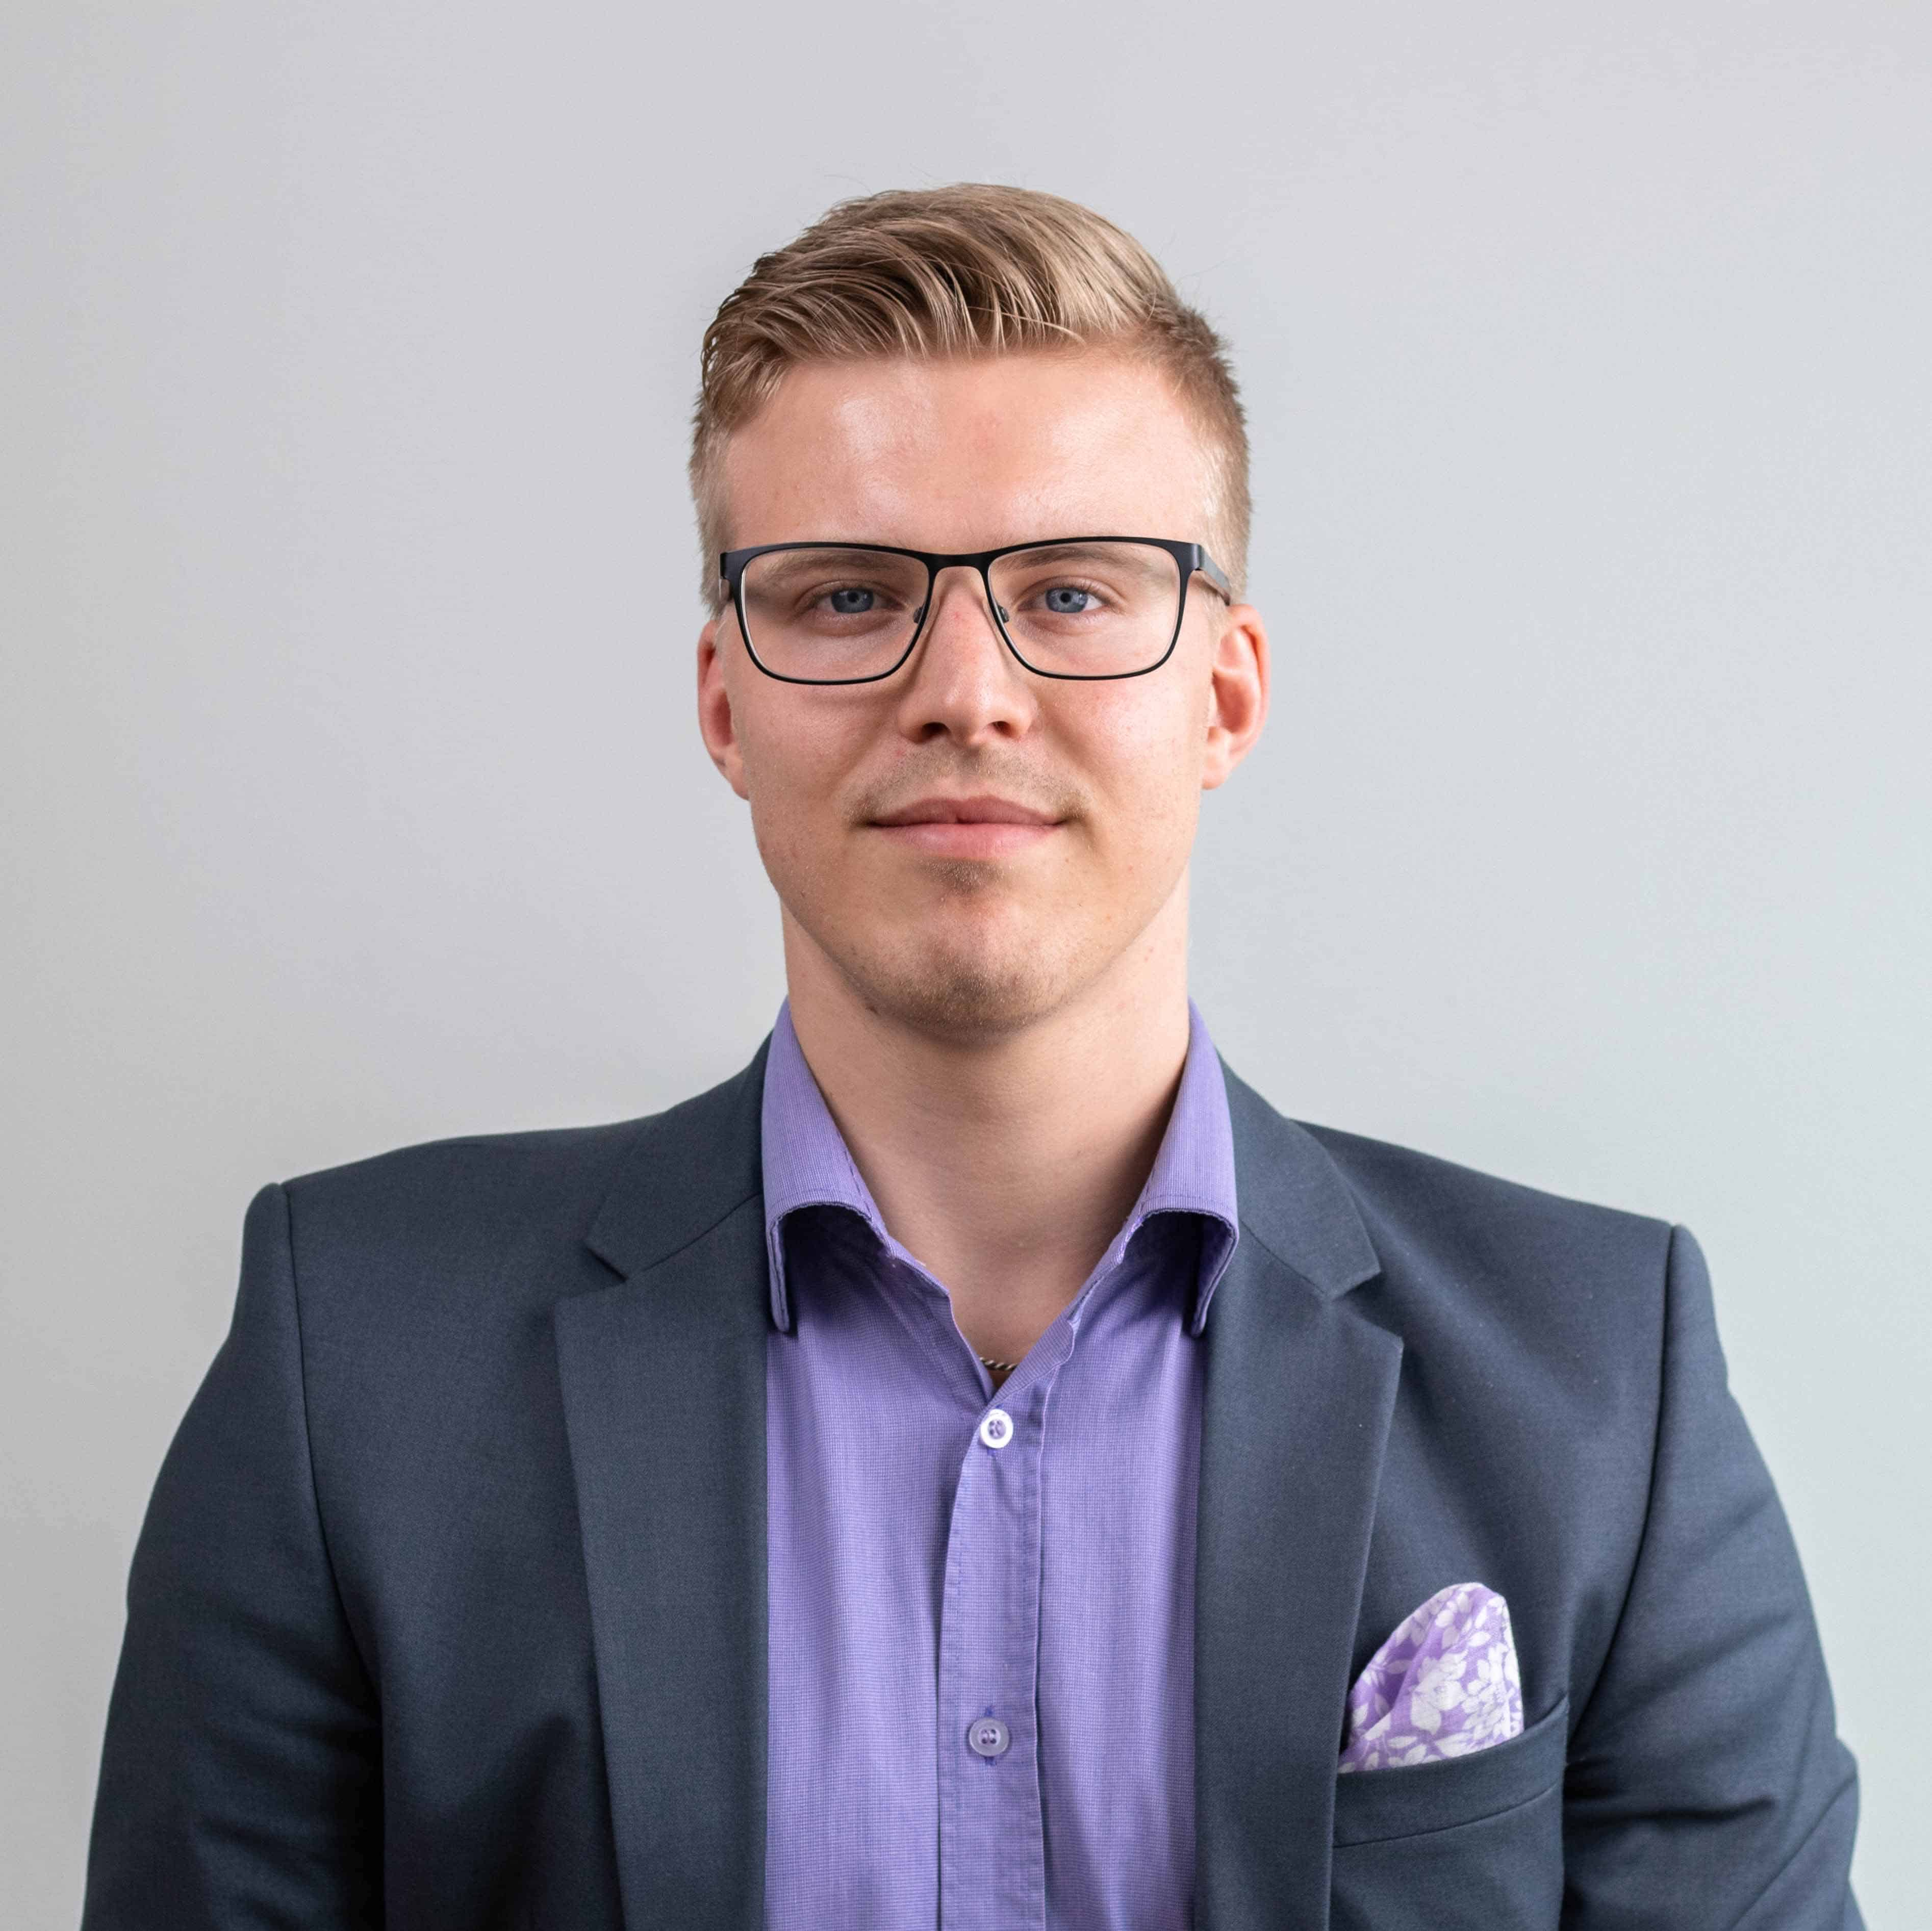 Mattias S Jönsson